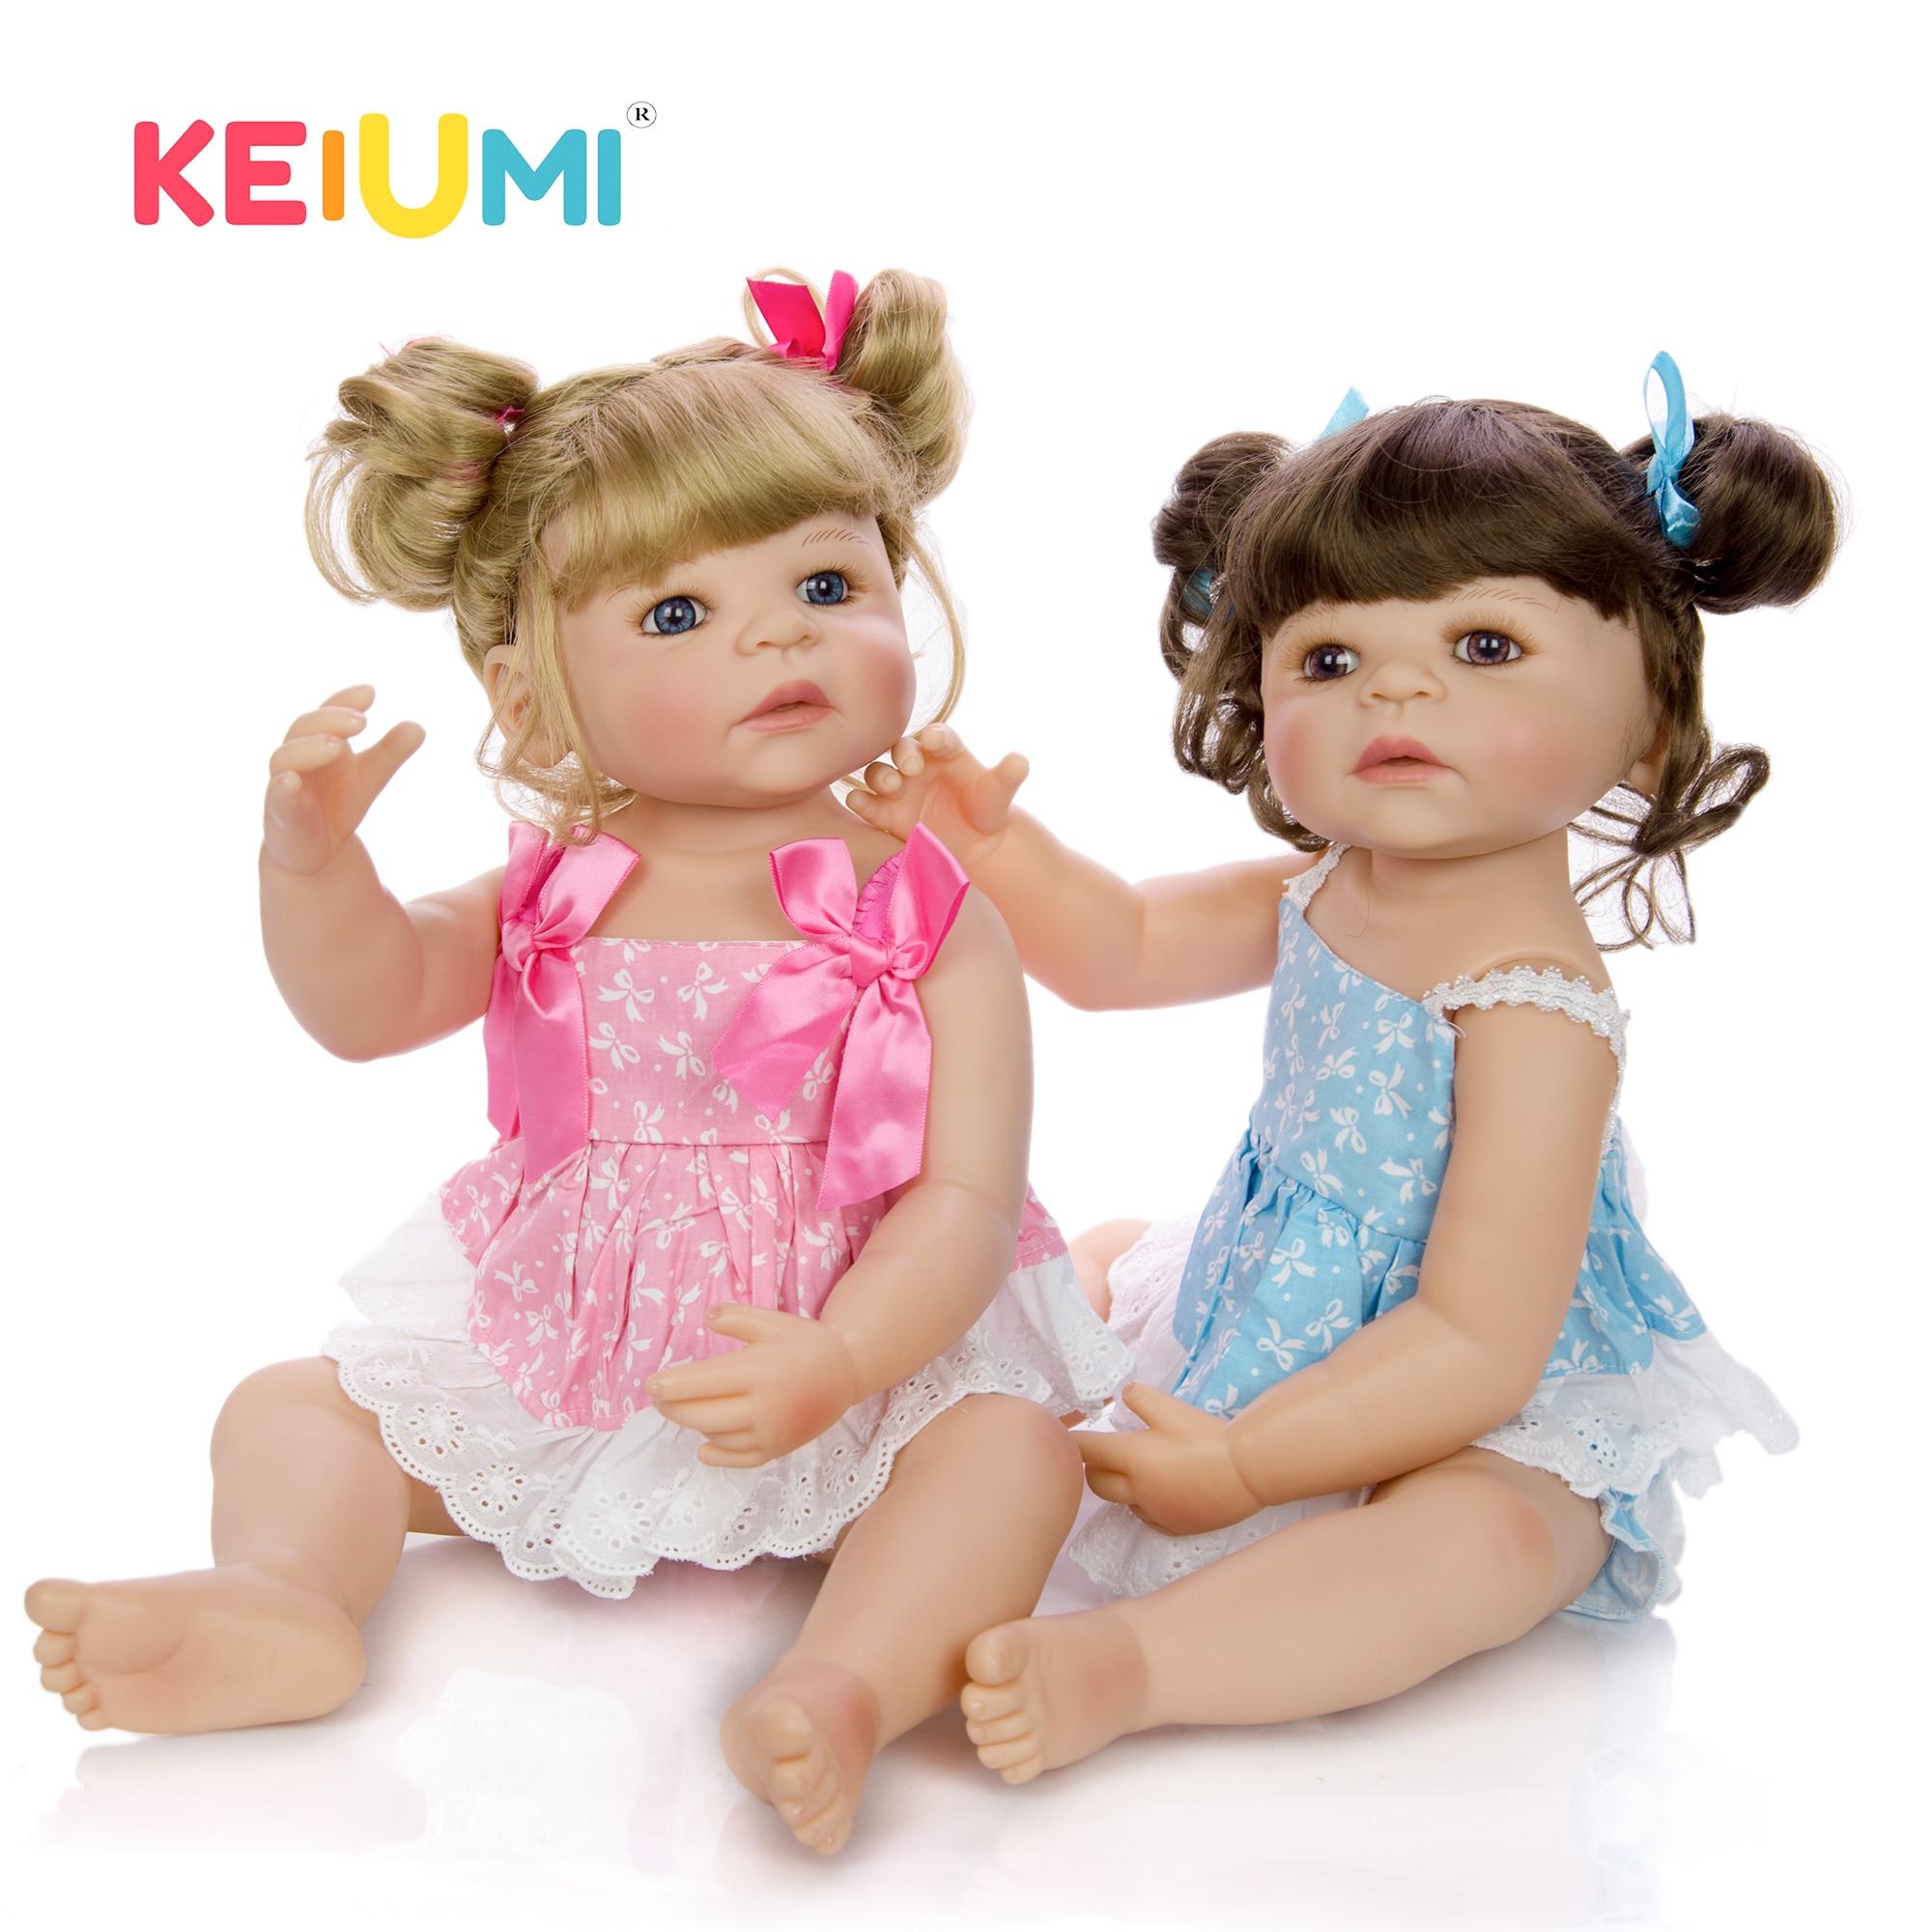 Lifelike 22 Inch Princess Twins Reborn Babies Girl Dolls For kids Playmates 55 cm KEIUMI Newborn Baby Doll 2019 Birthday Gifts-in Dolls from Toys & Hobbies    1